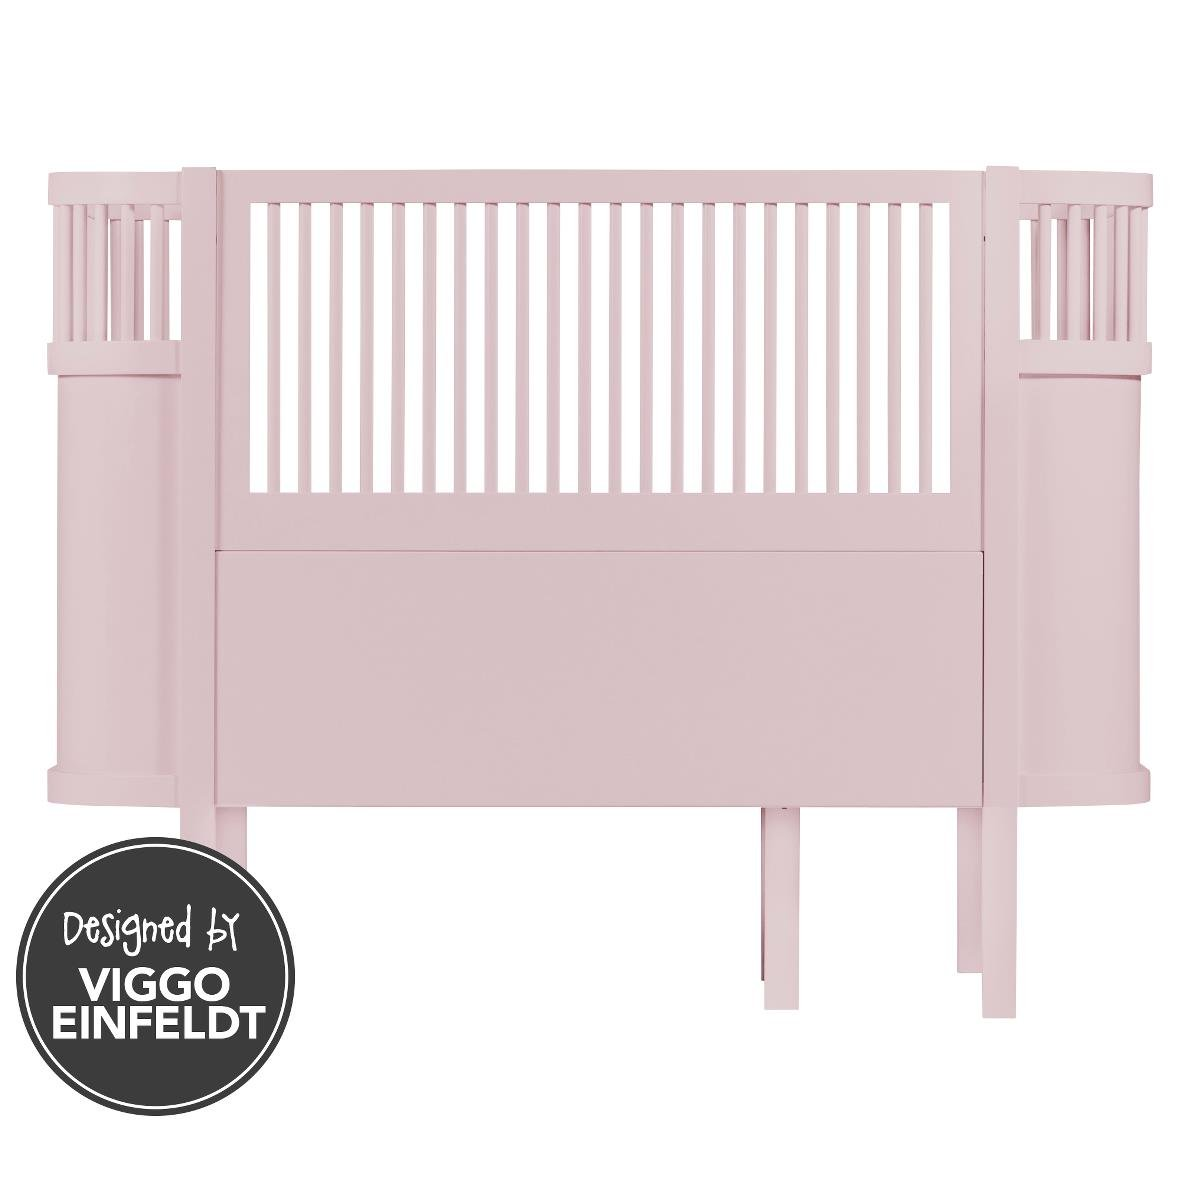 Das Sebra Bett - Baby & Juniorbett - das Bett, dass mit dem Kind wächst - altrosa